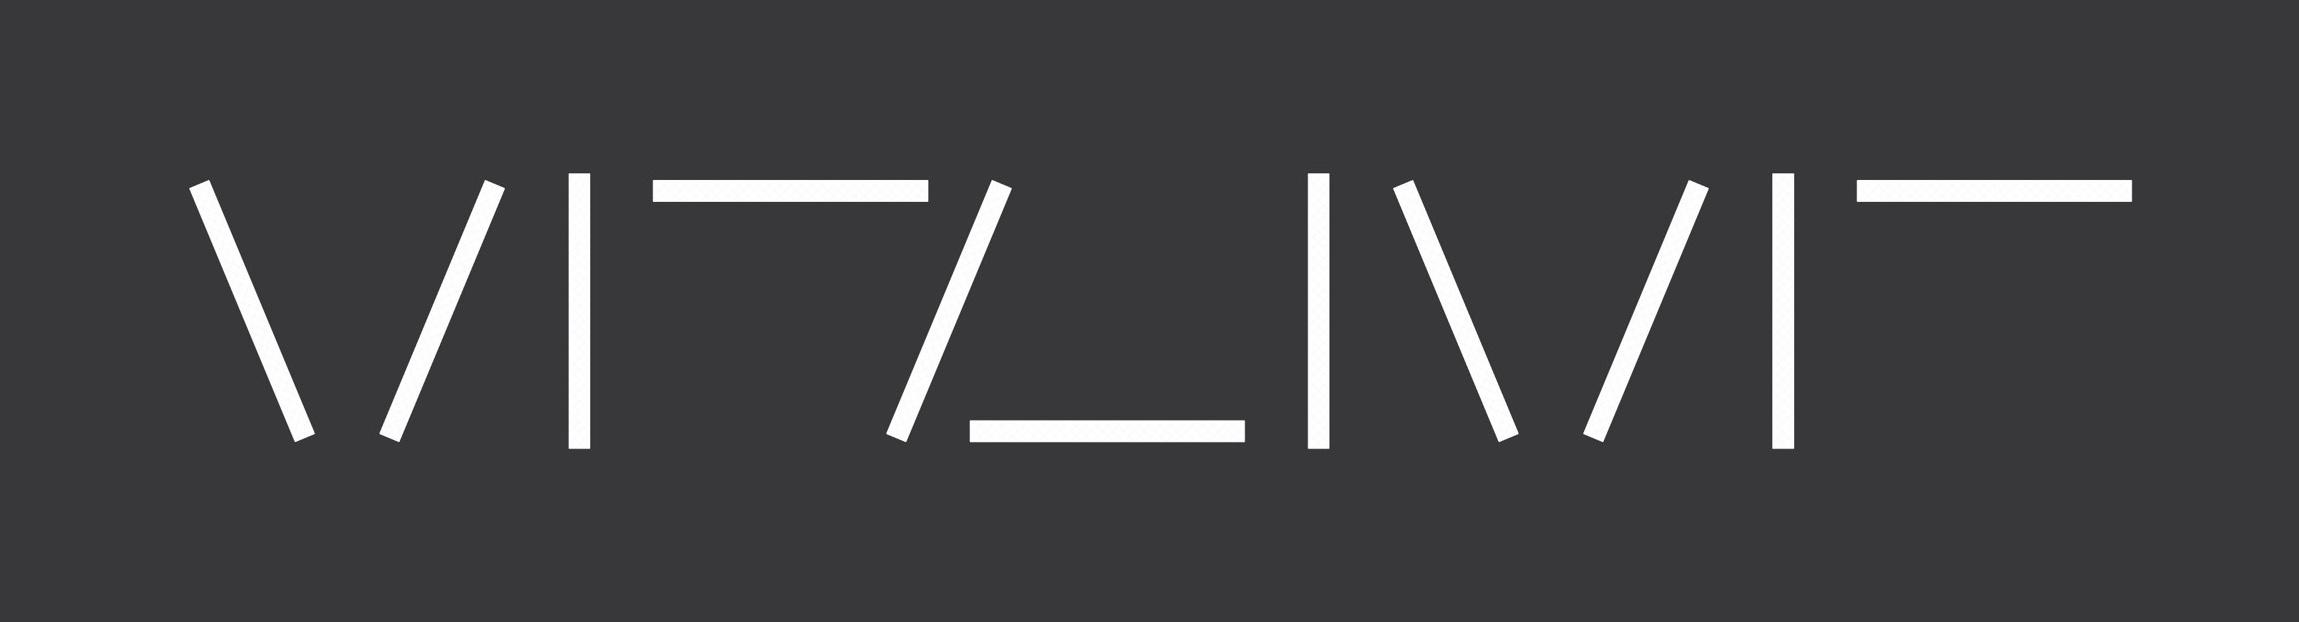 vizivr-logo-start-01_011.jpg